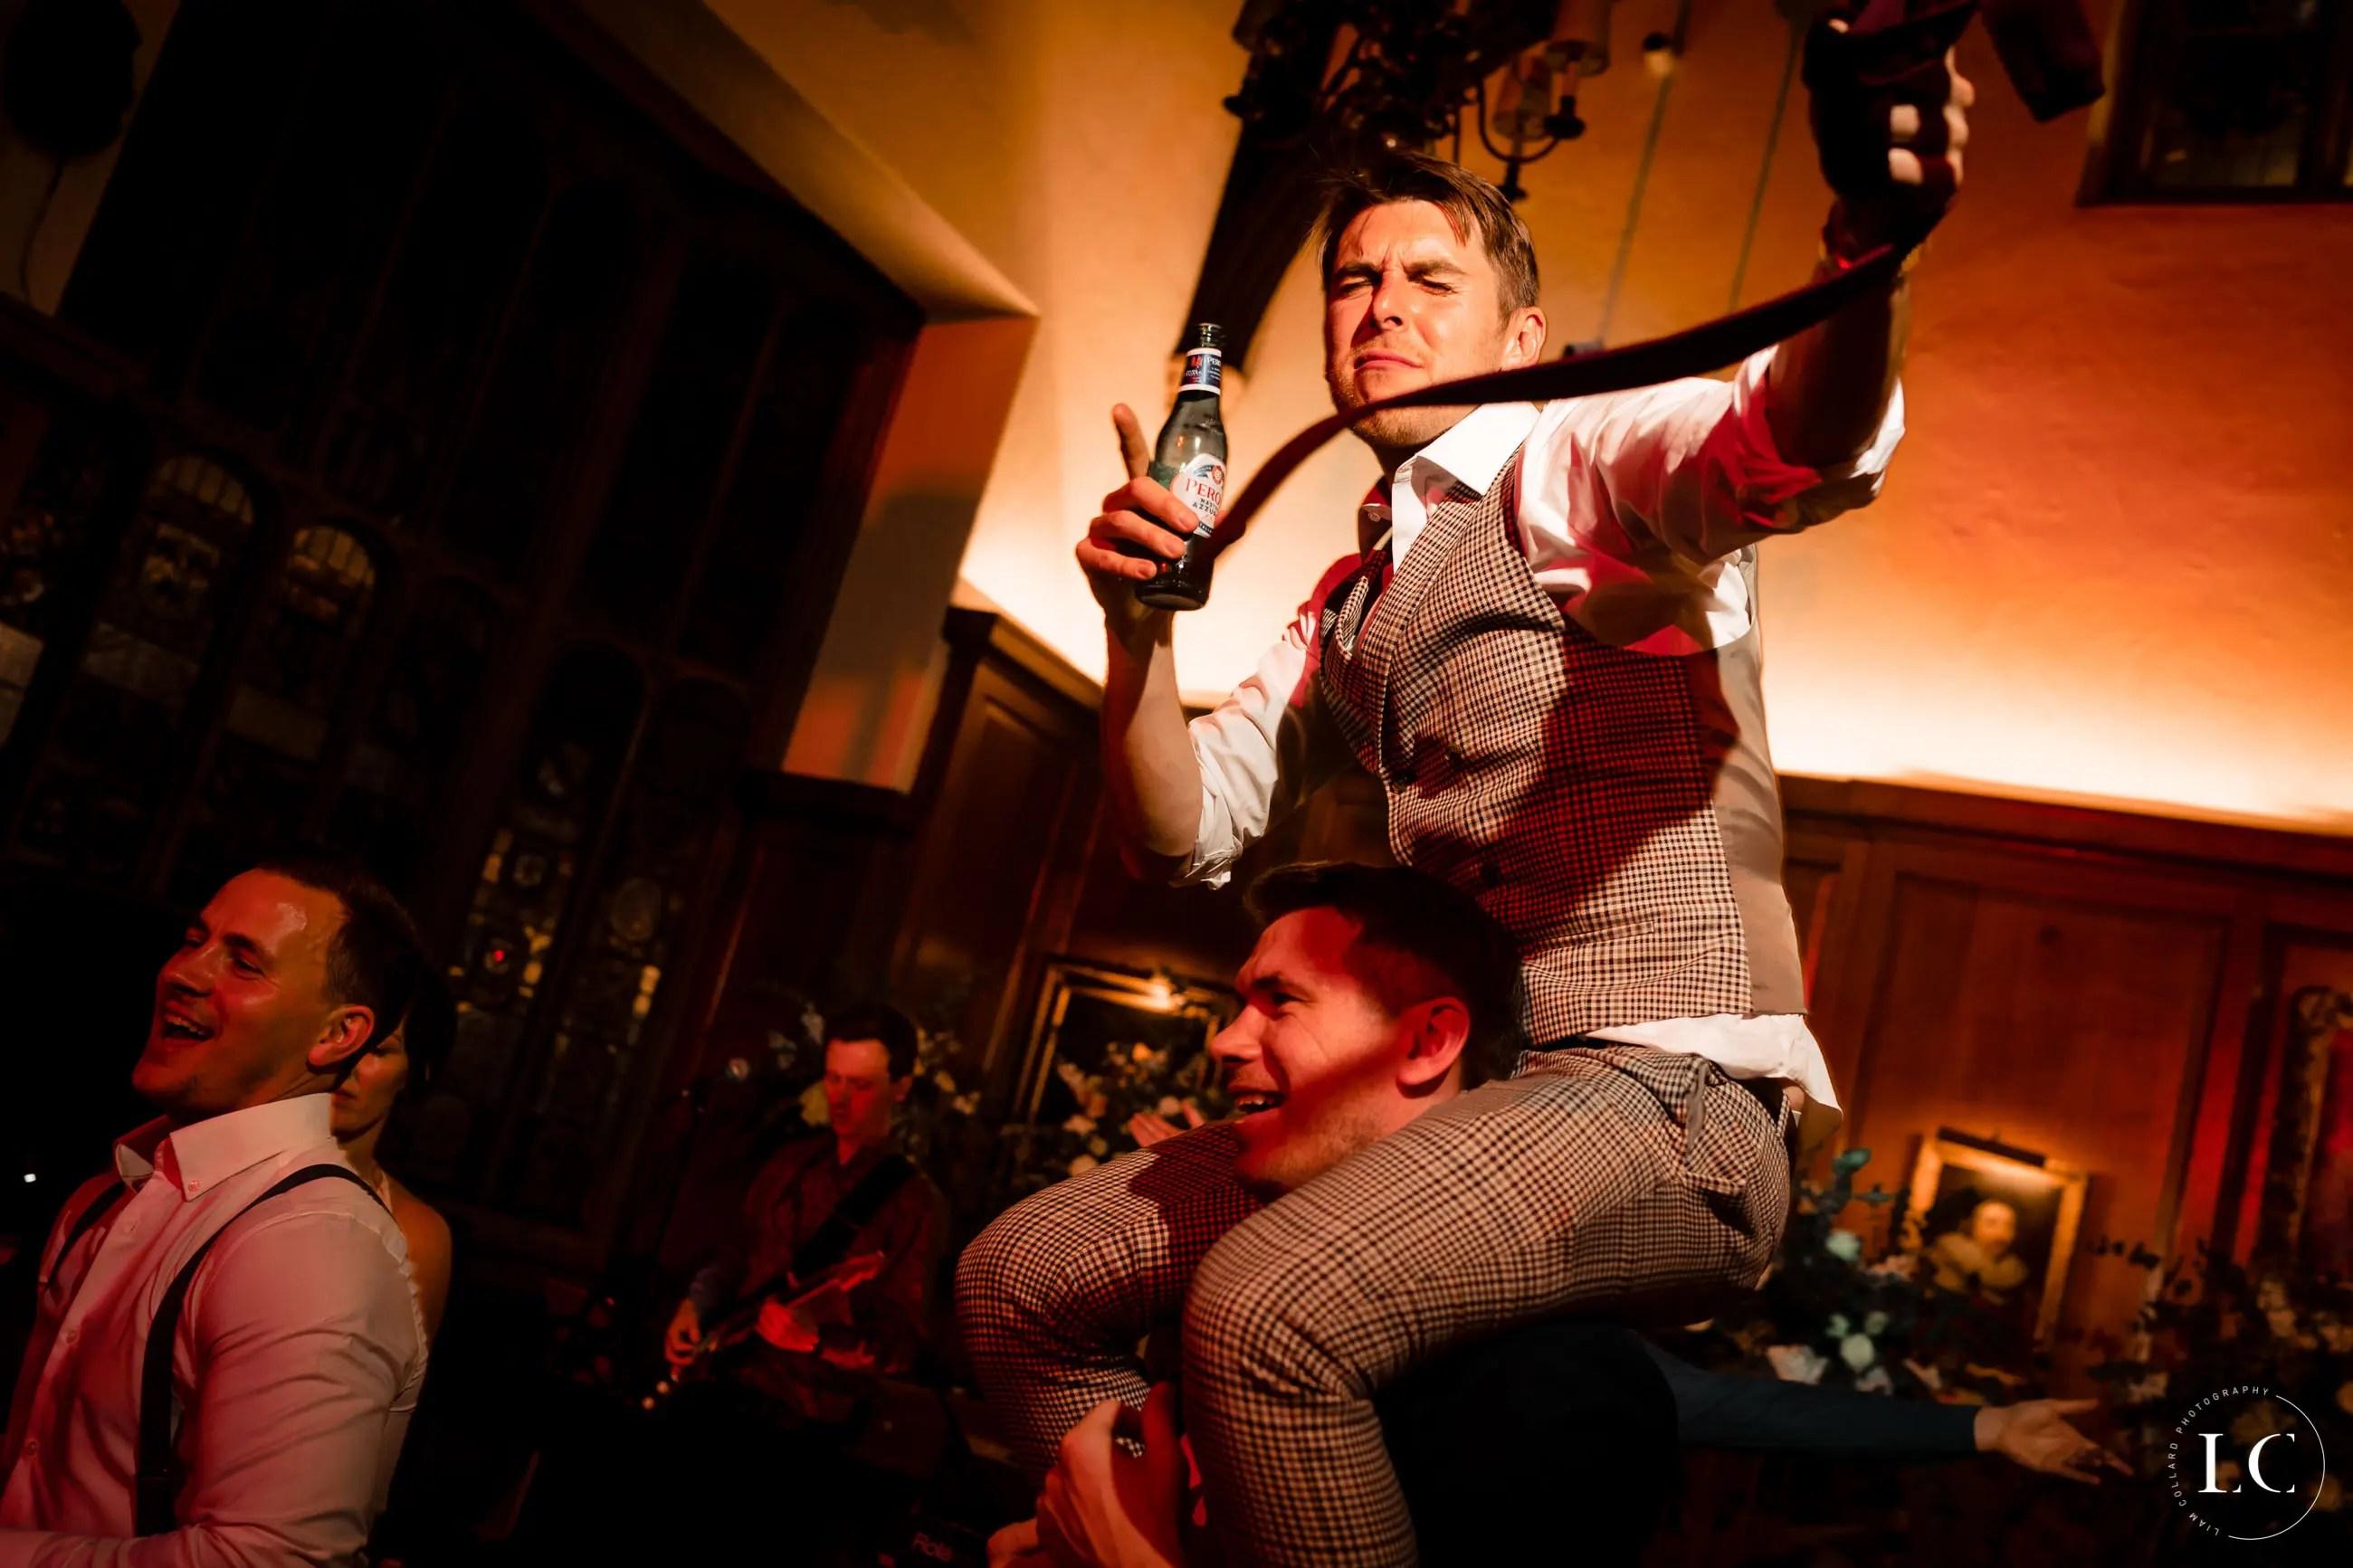 Best man dancing wedding reception